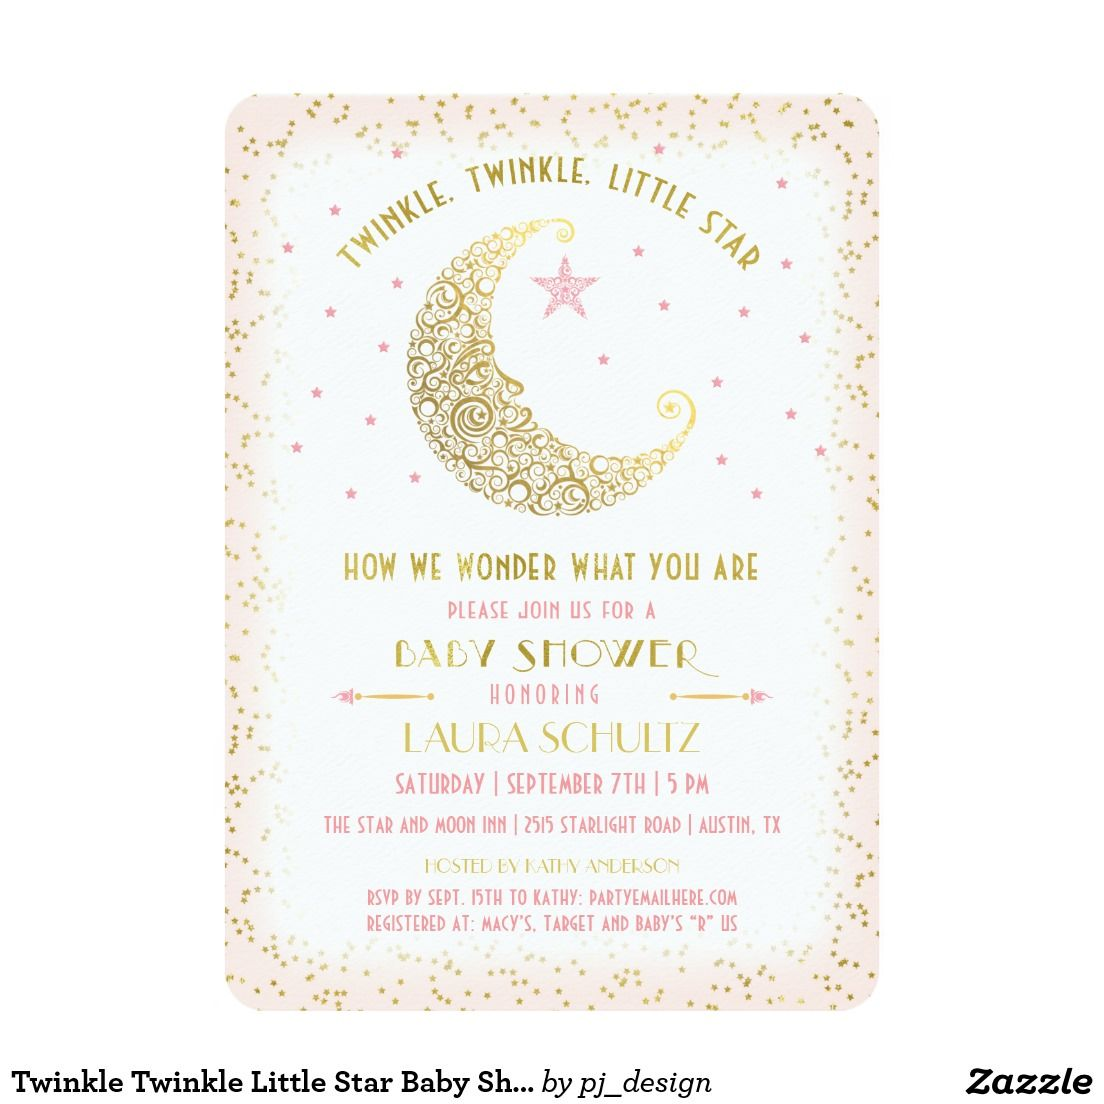 Twinkle Twinkle Little Star Baby Shower Invitation | Baby Shower ...